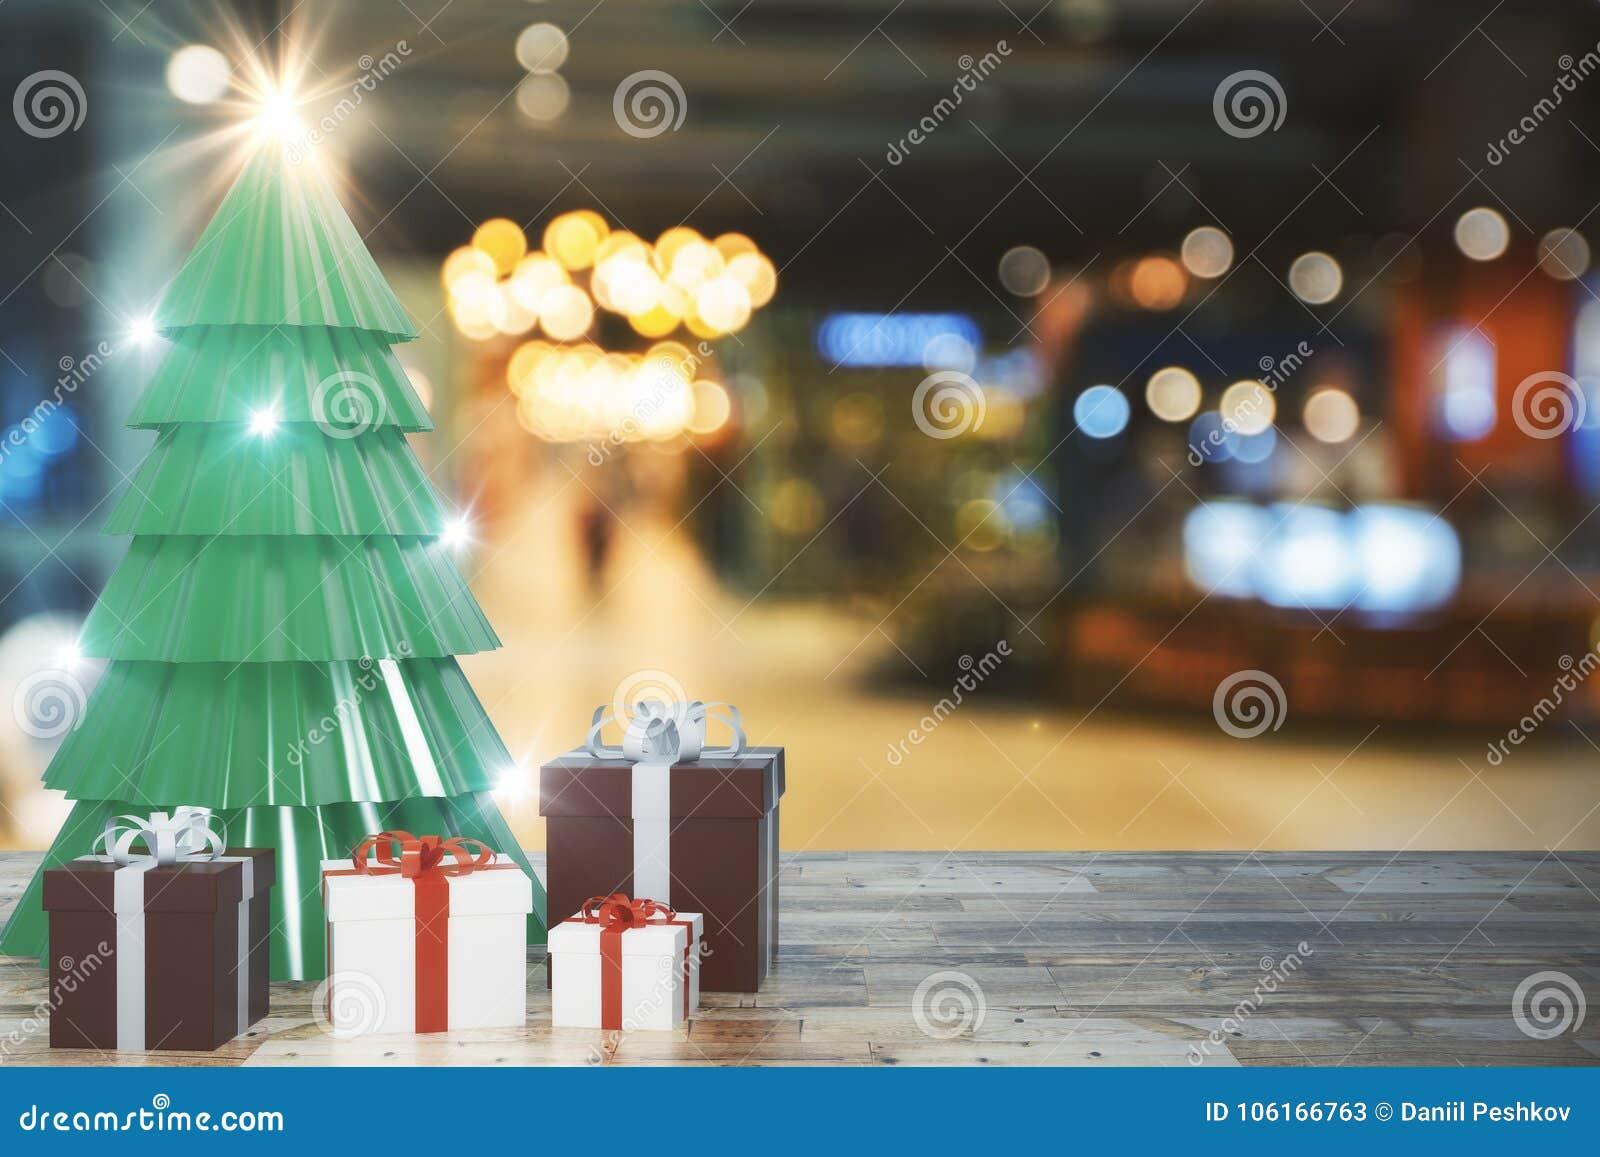 Creative christmas tree backdrop